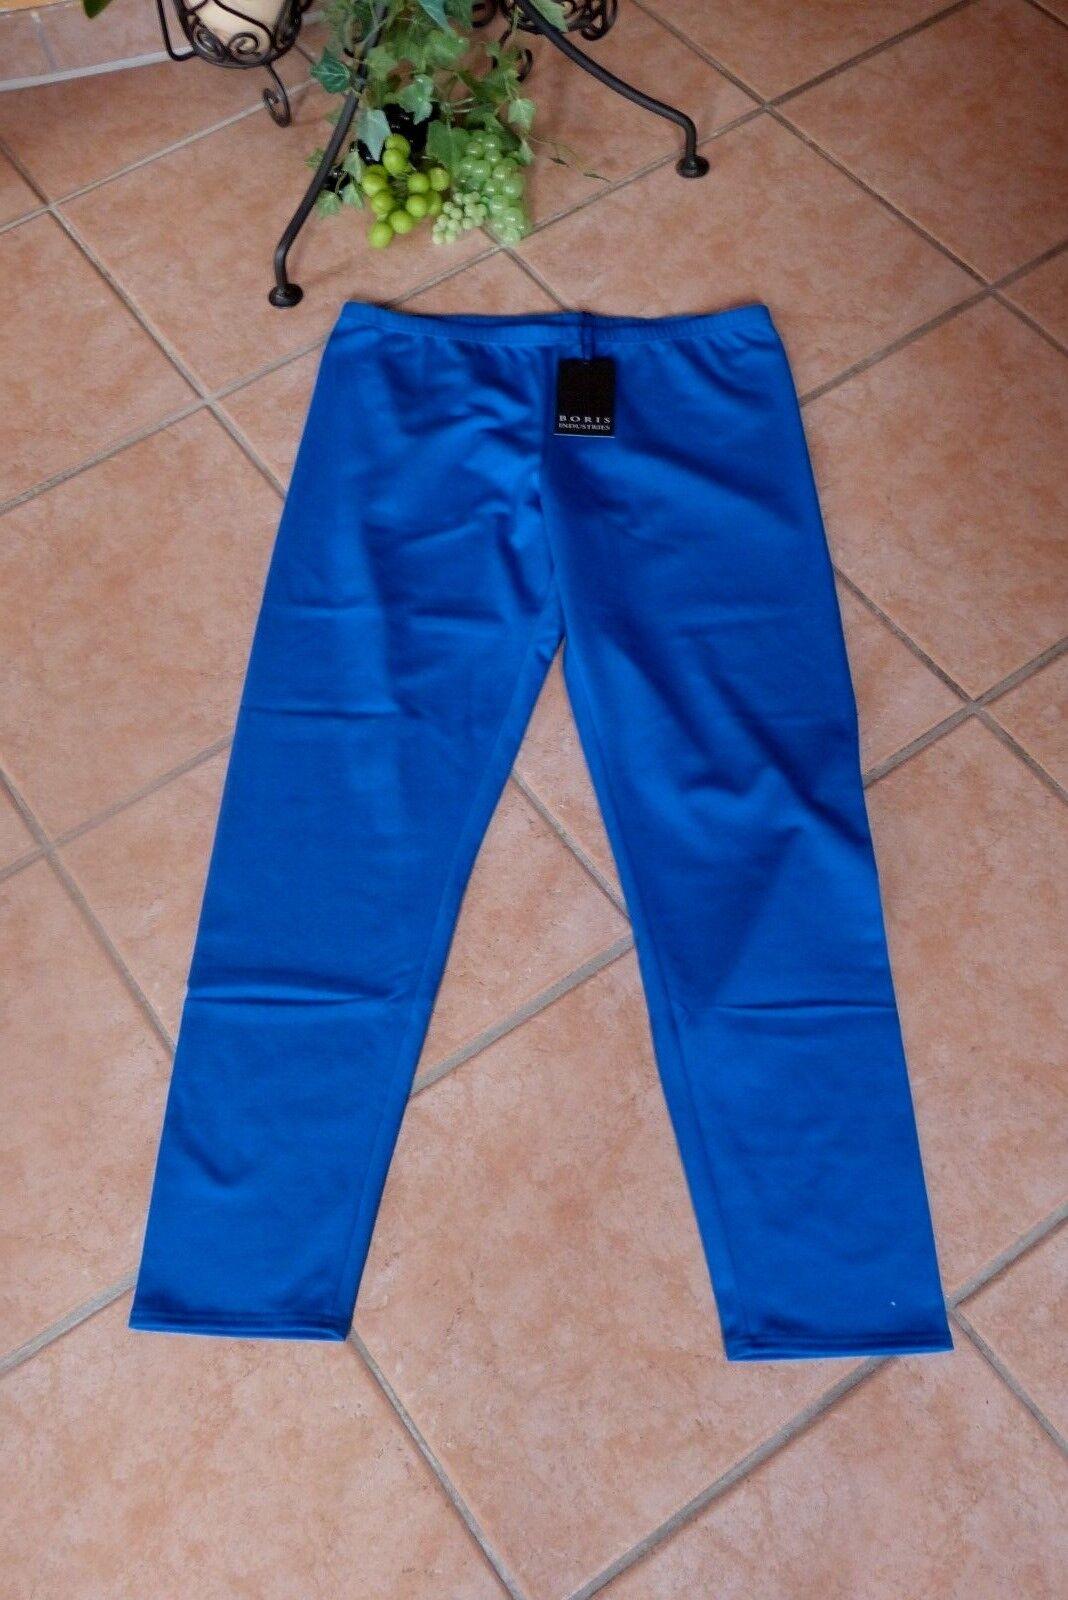 BORIS INDUSTRIES Leggings Winter 40 42 (2) NEU royal blue Double Face LAGENLOOK